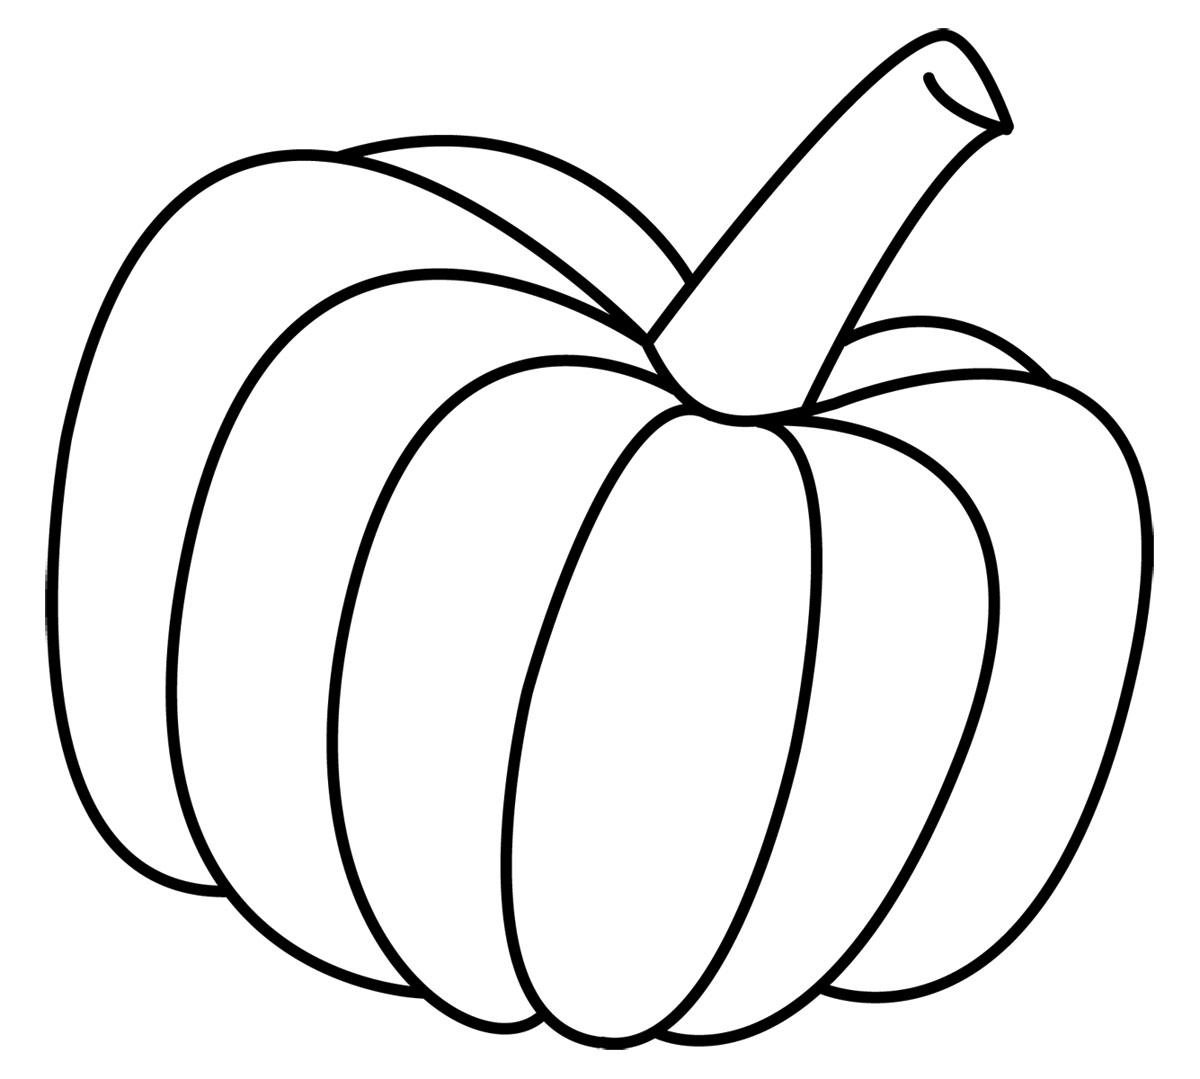 The Craftinomicon Halloween Cards